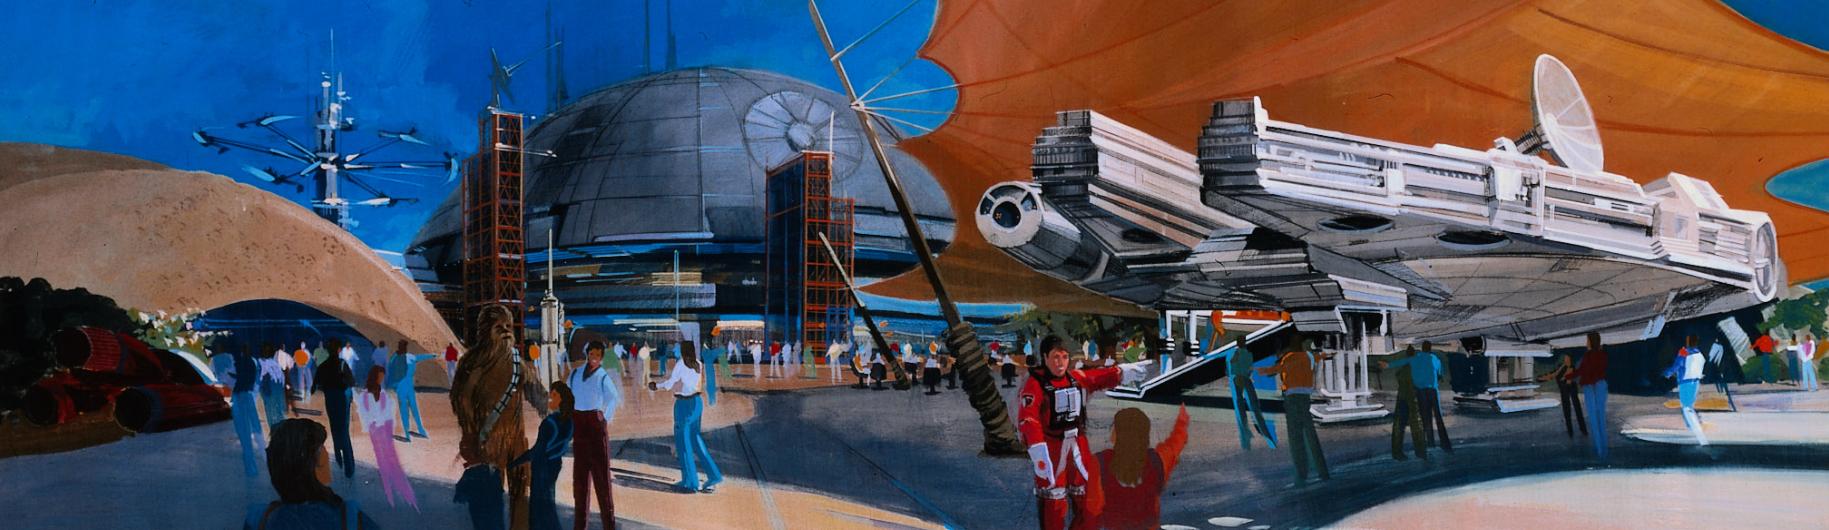 Star wars Concept DLP_edited.jpg